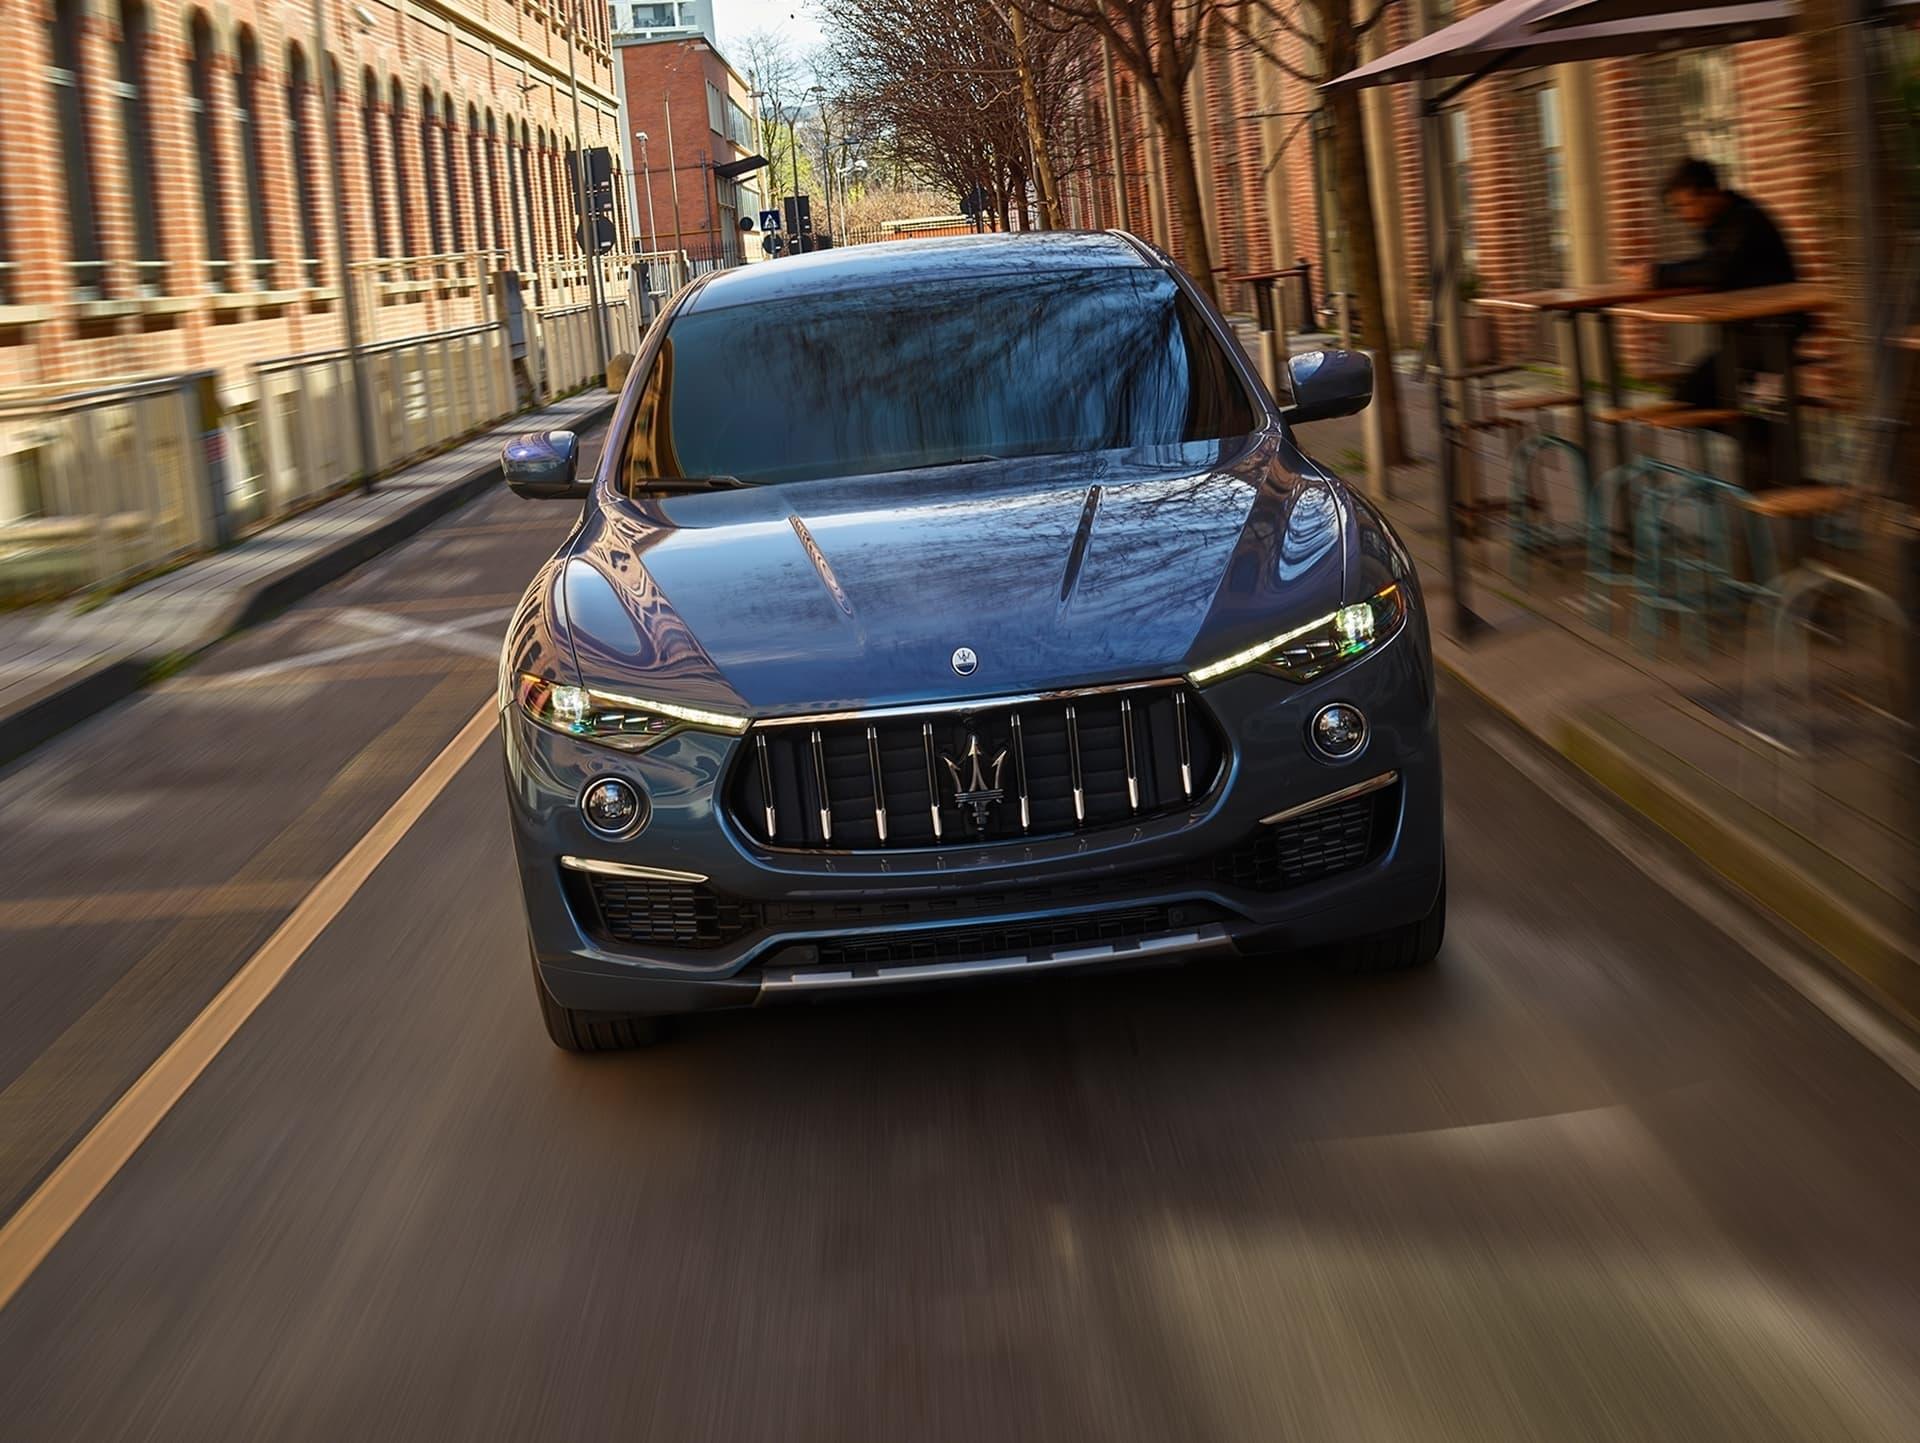 Maserati Levante Hybrid 2021 0421 030